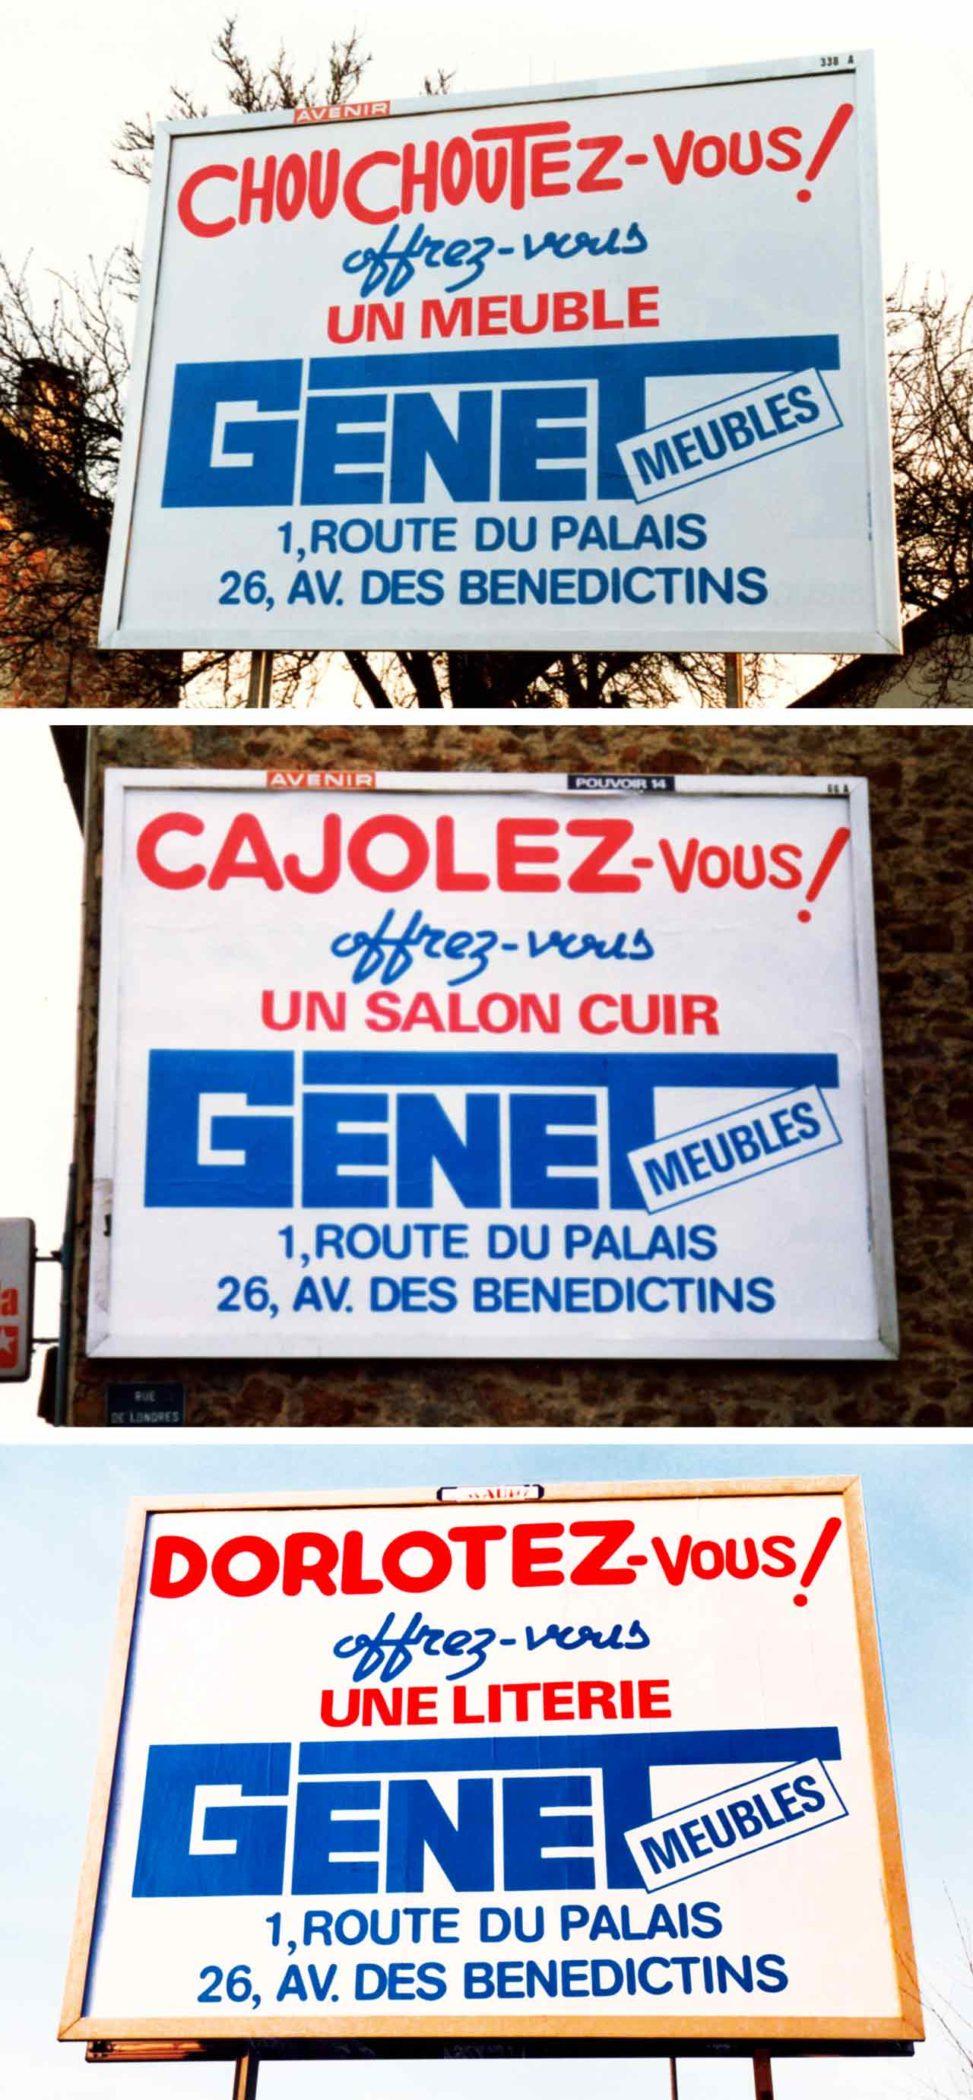 Meubles-Genet-1985-Agence Scandere-Limoges